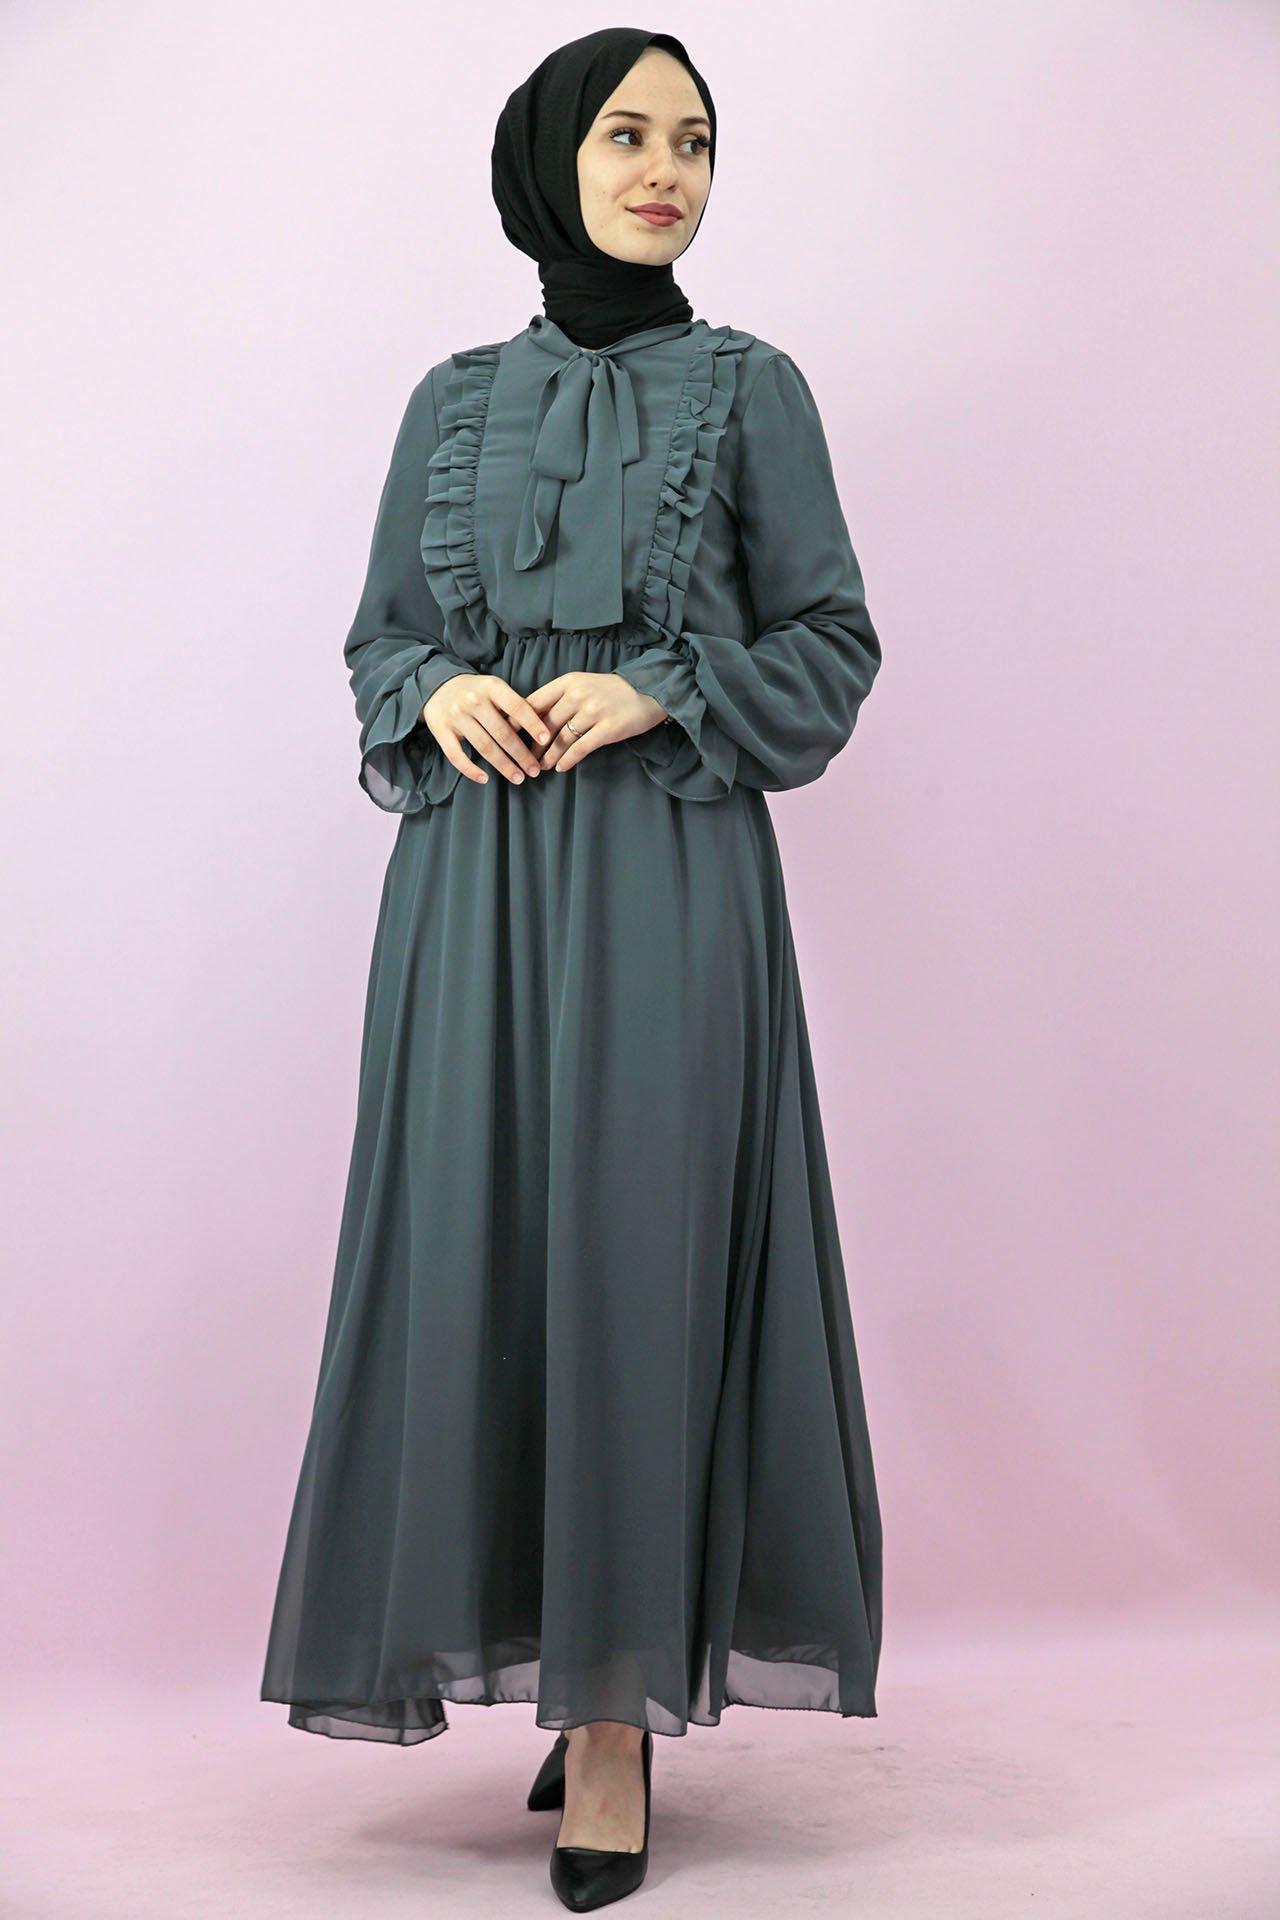 GİZAGİYİM - Giza Beli Lastikli Fırfırlı Elbise Gri